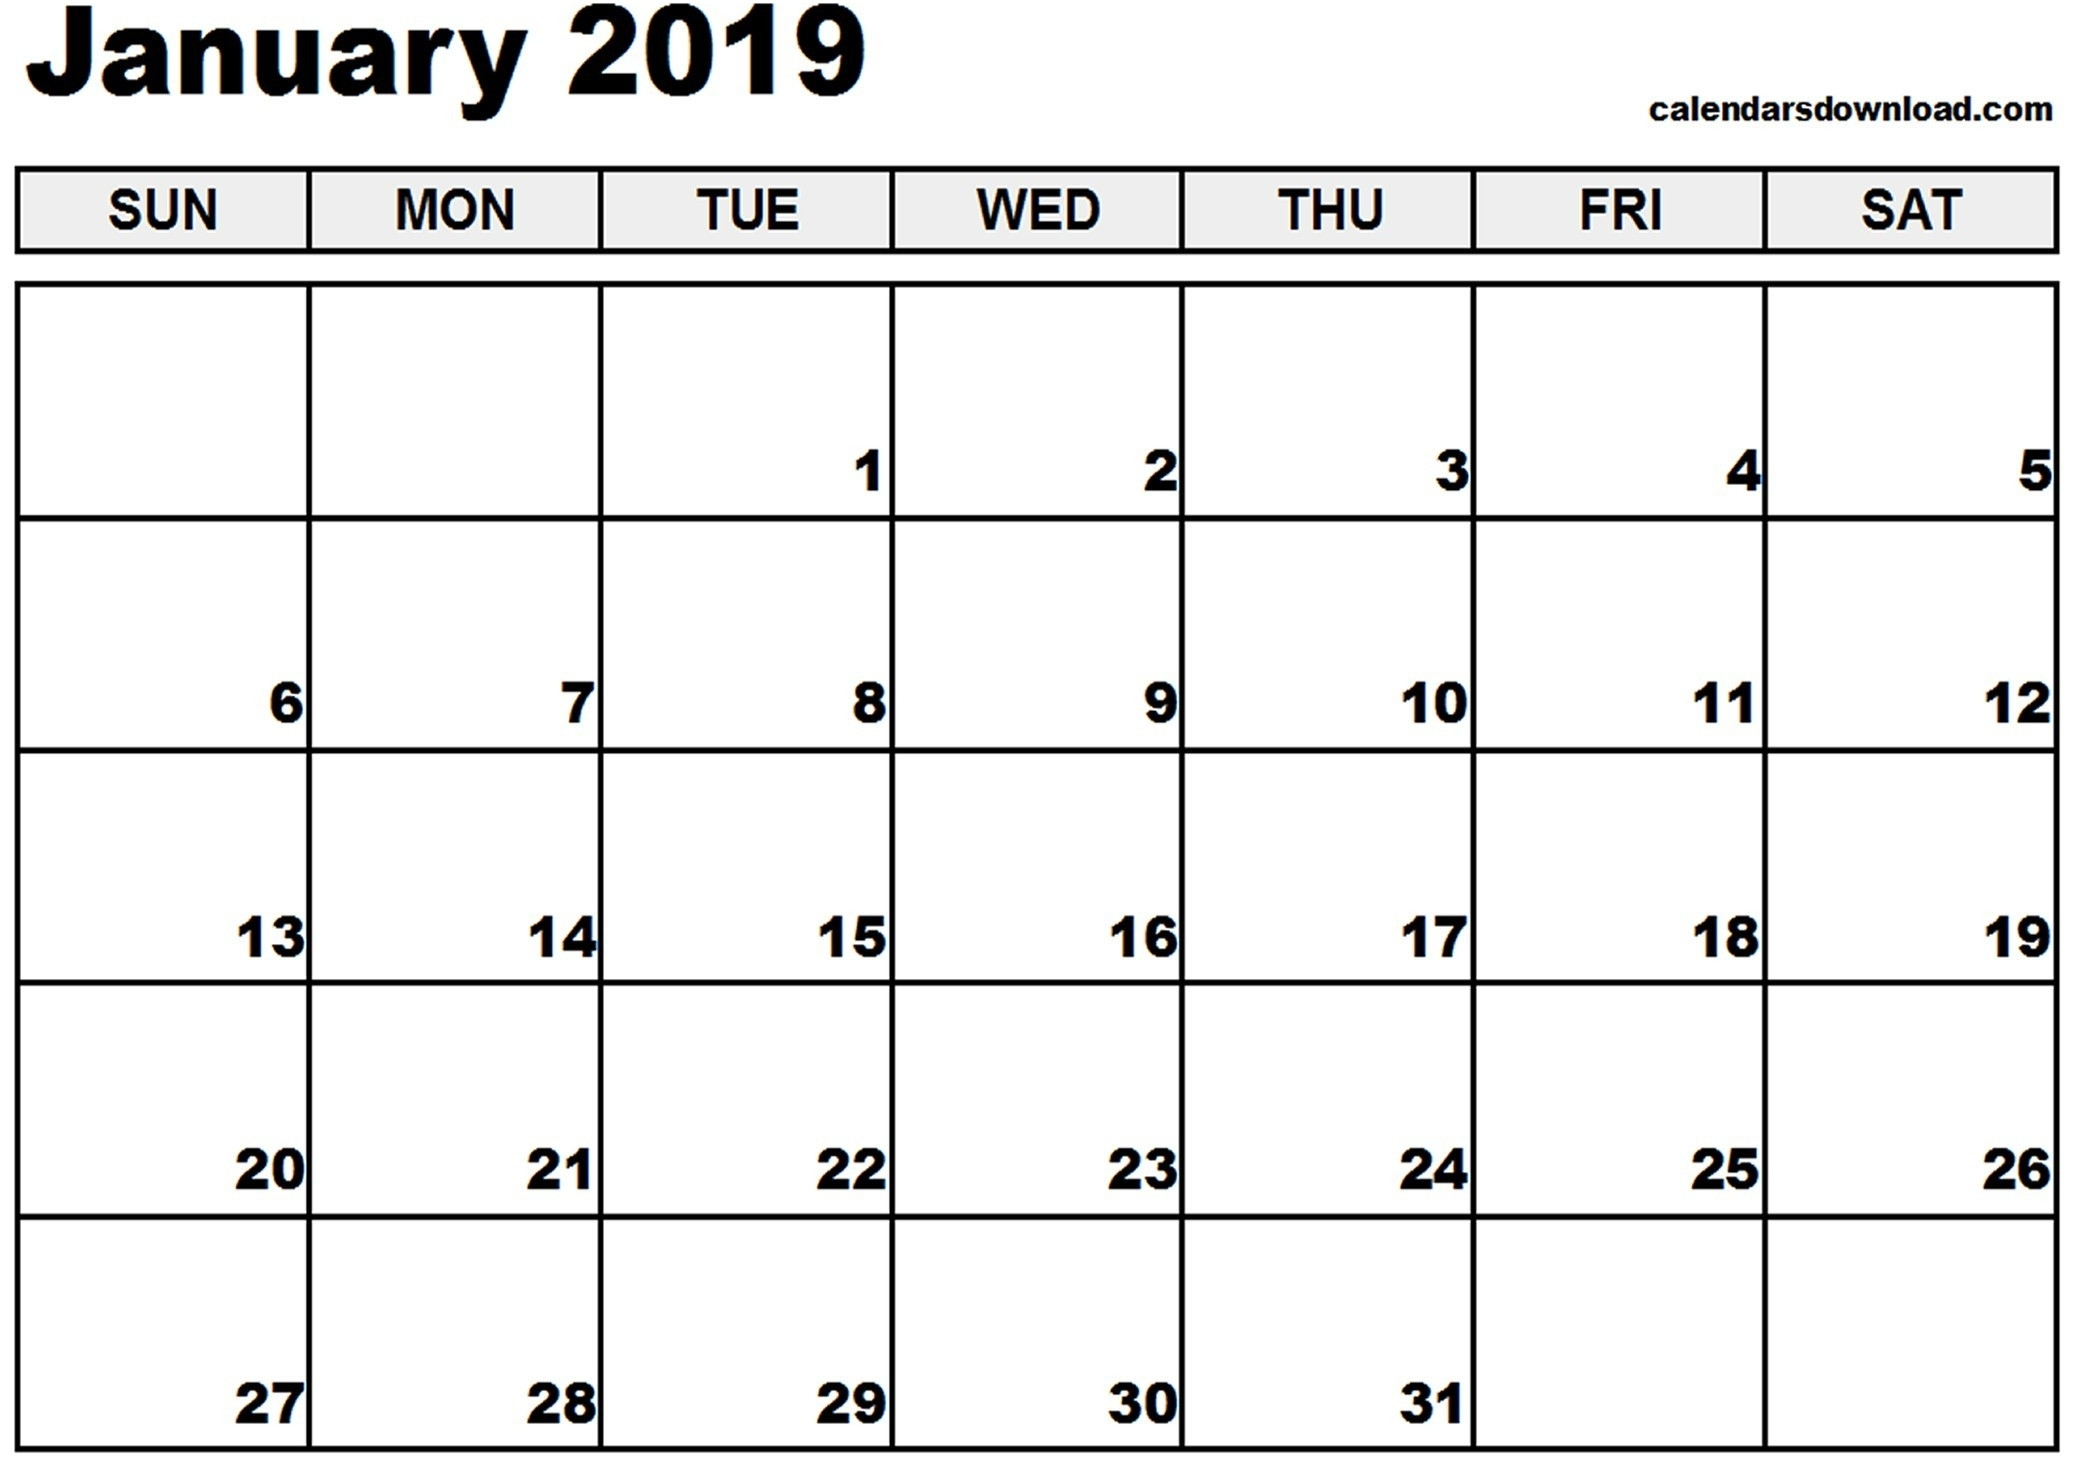 Timeanddate Com Printable Calendar 2019 | Printable Calendar